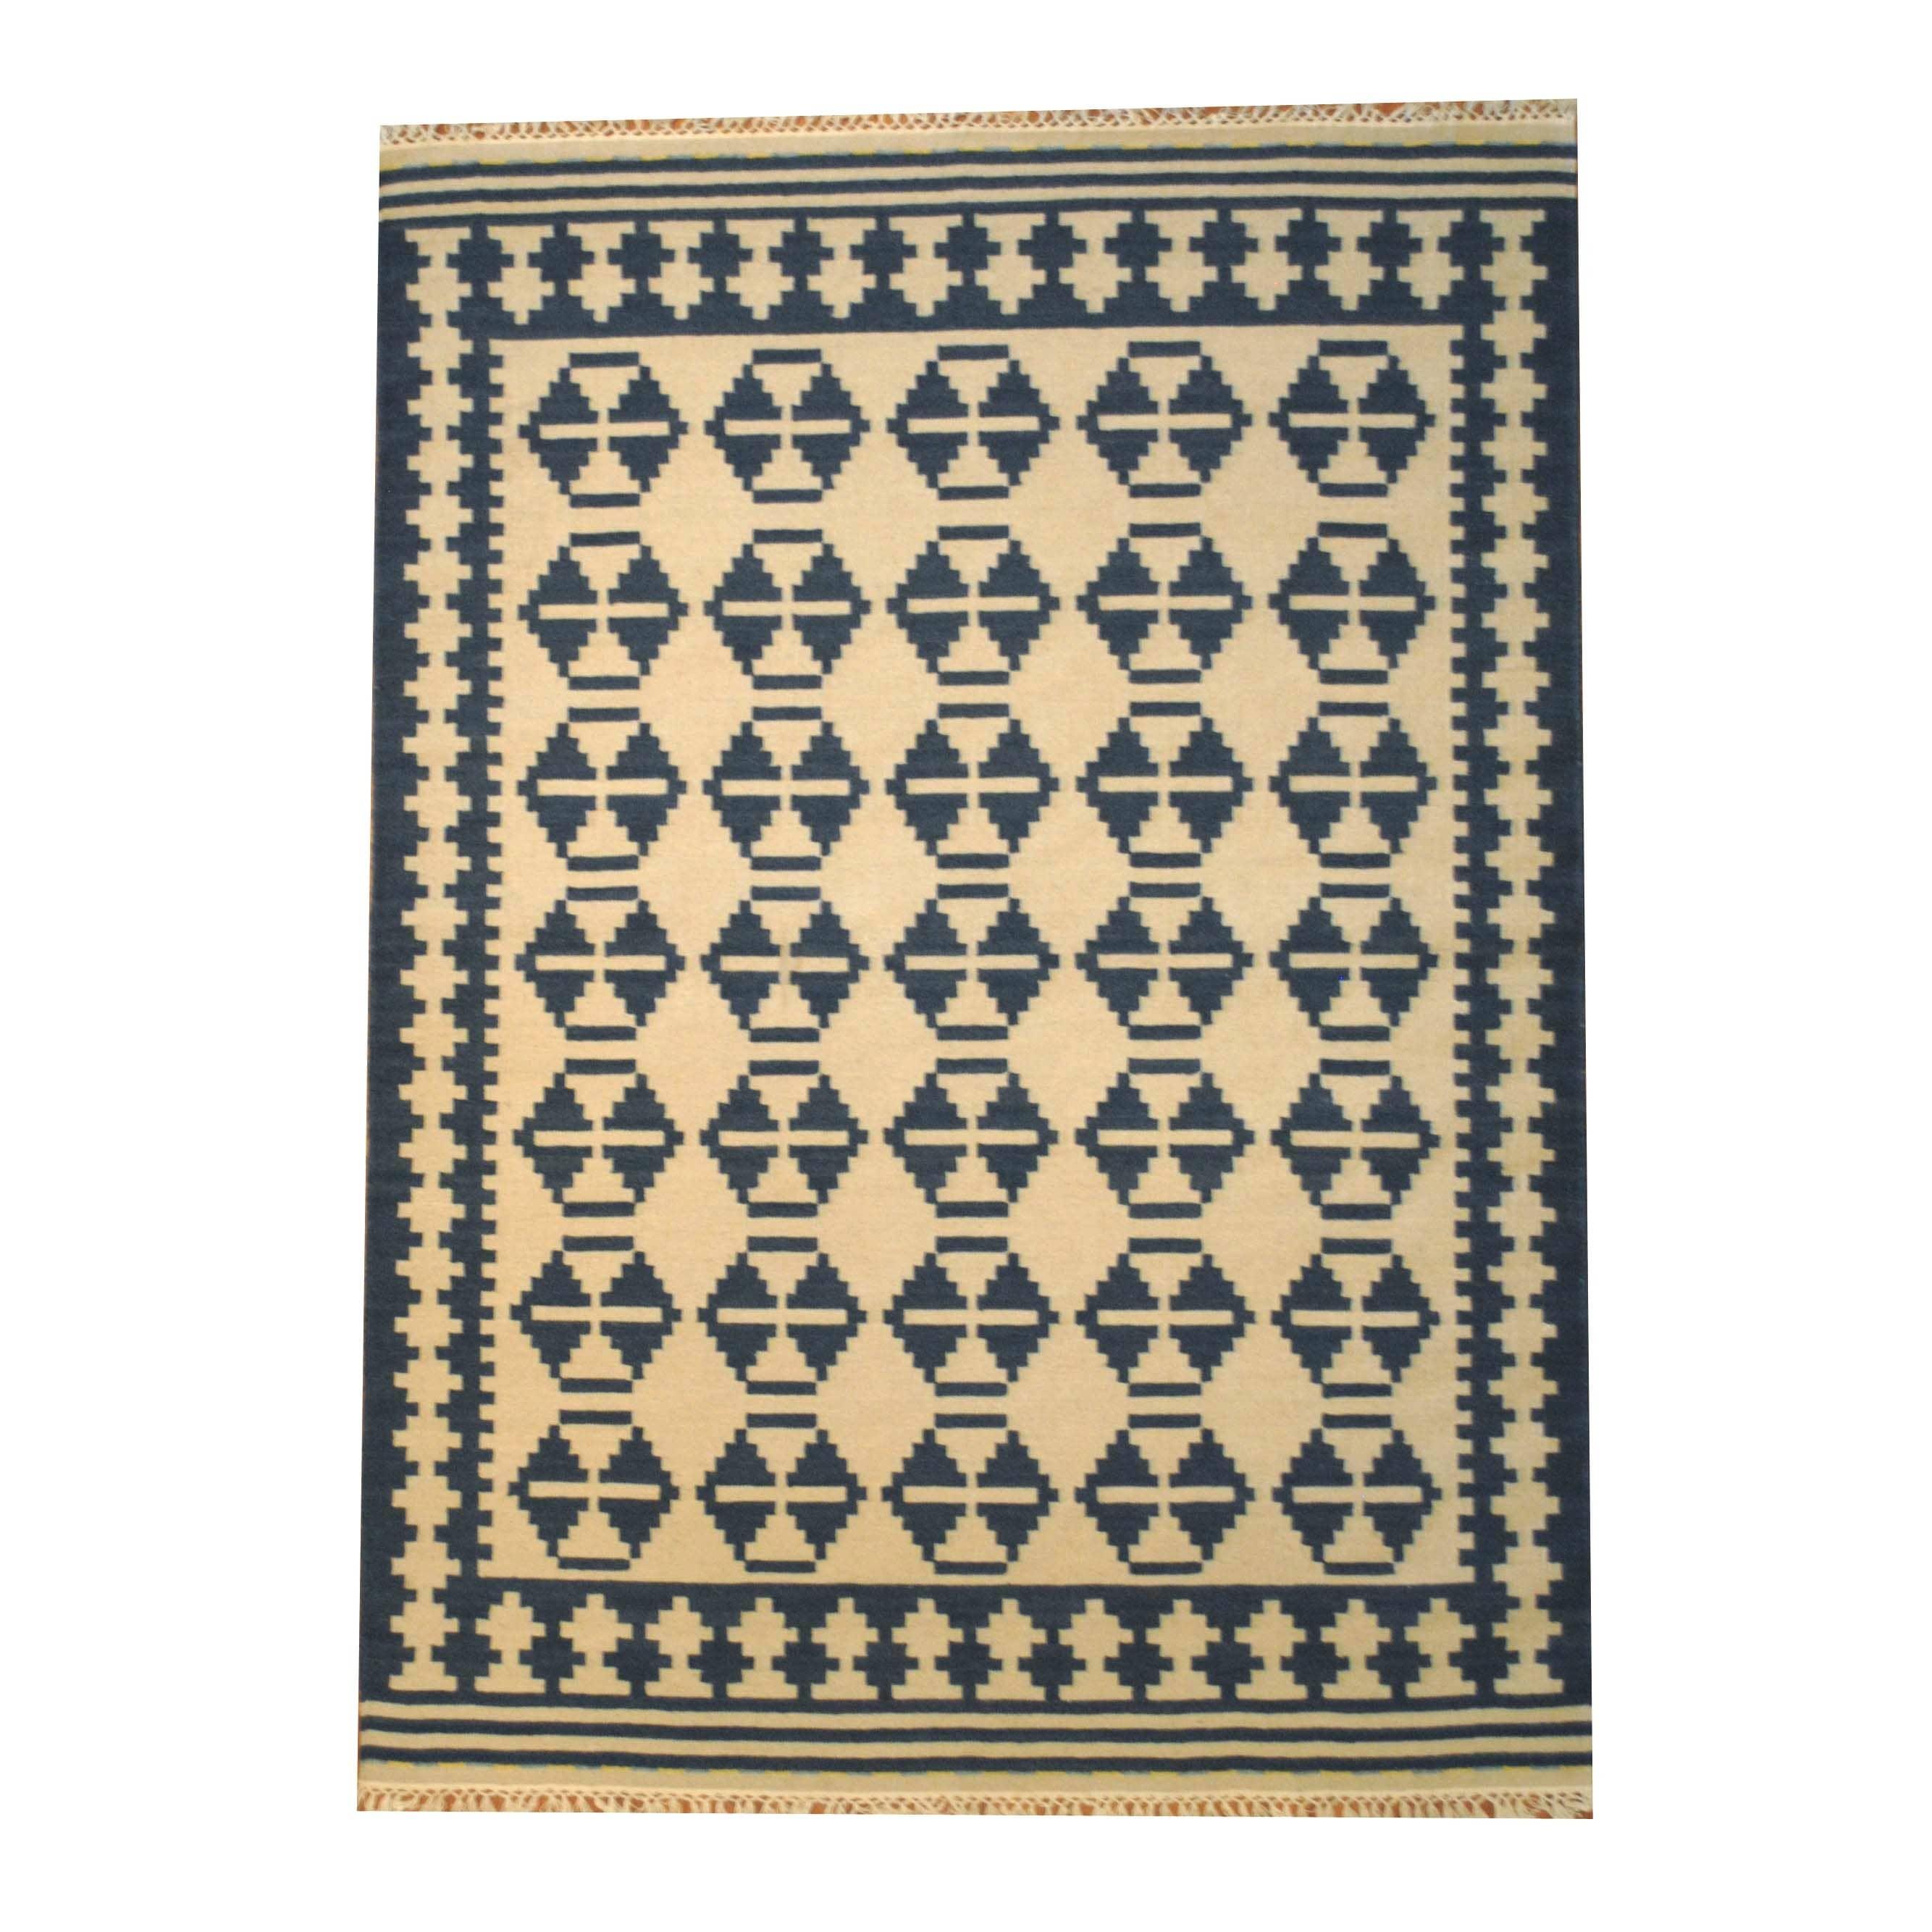 Handmade Wool Kilim Rug India 5 6 X